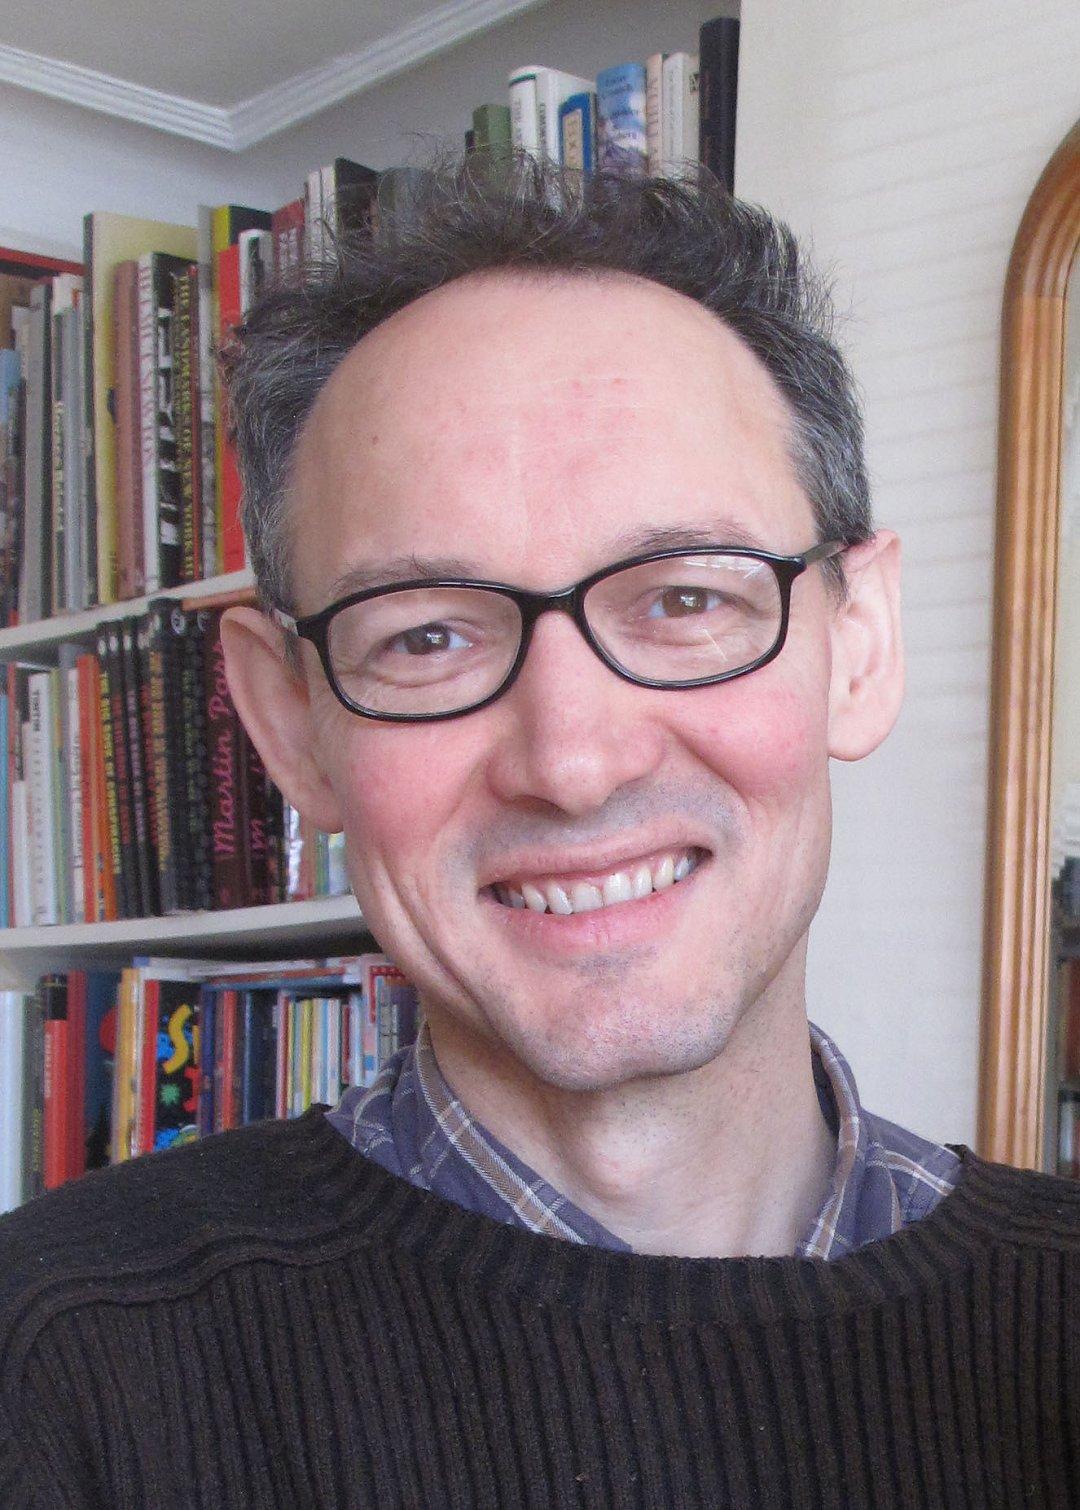 Roger Langridge